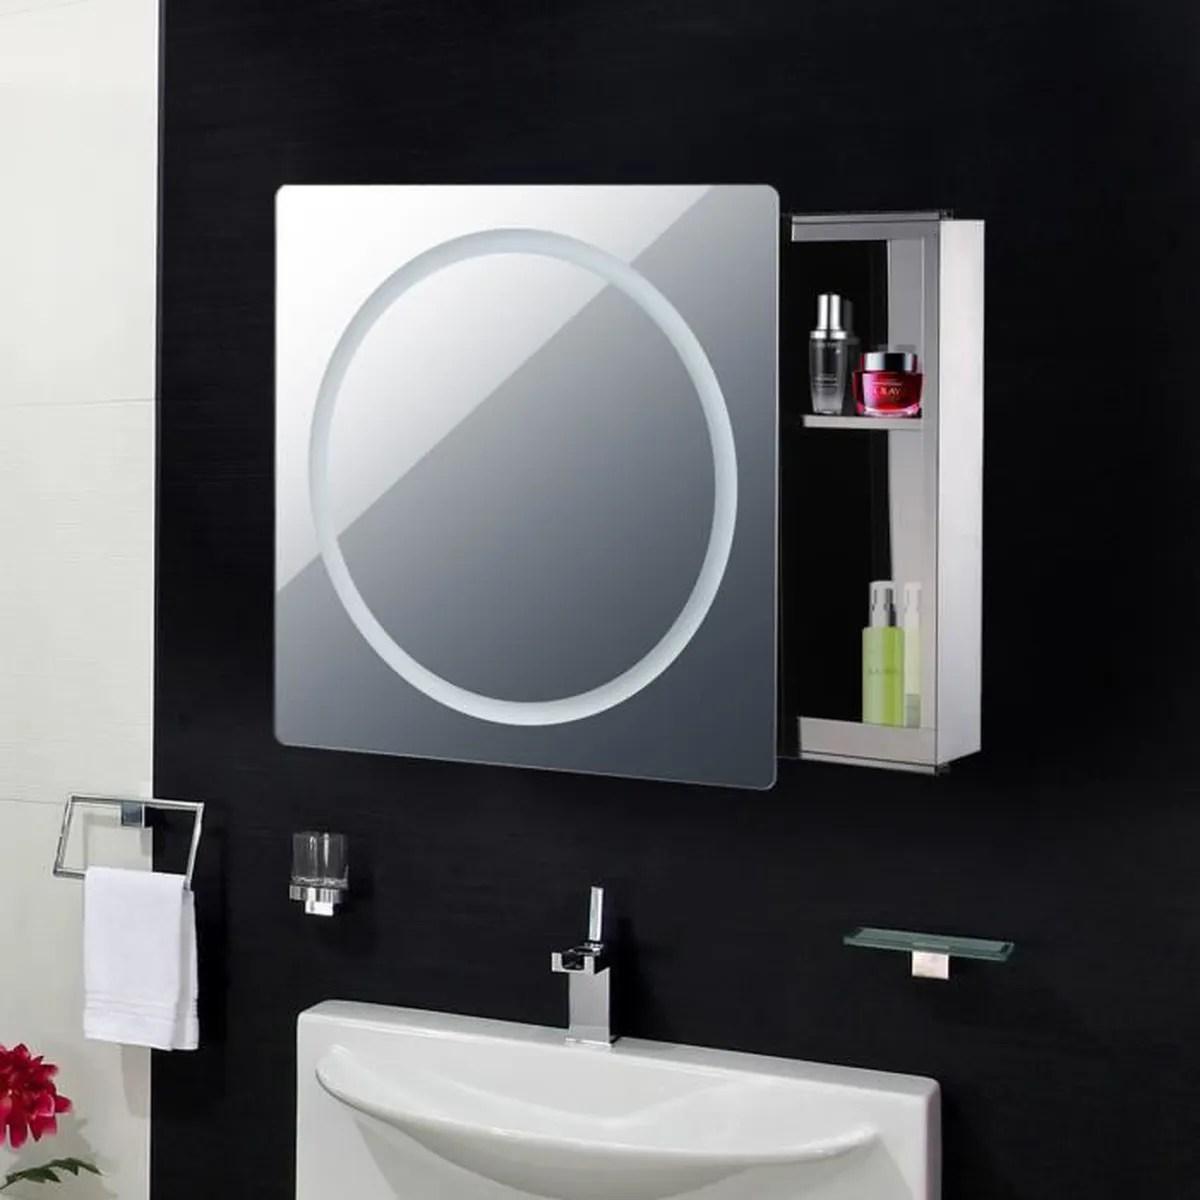 Armoire De Toilette Salle De Bain Miroir Murale